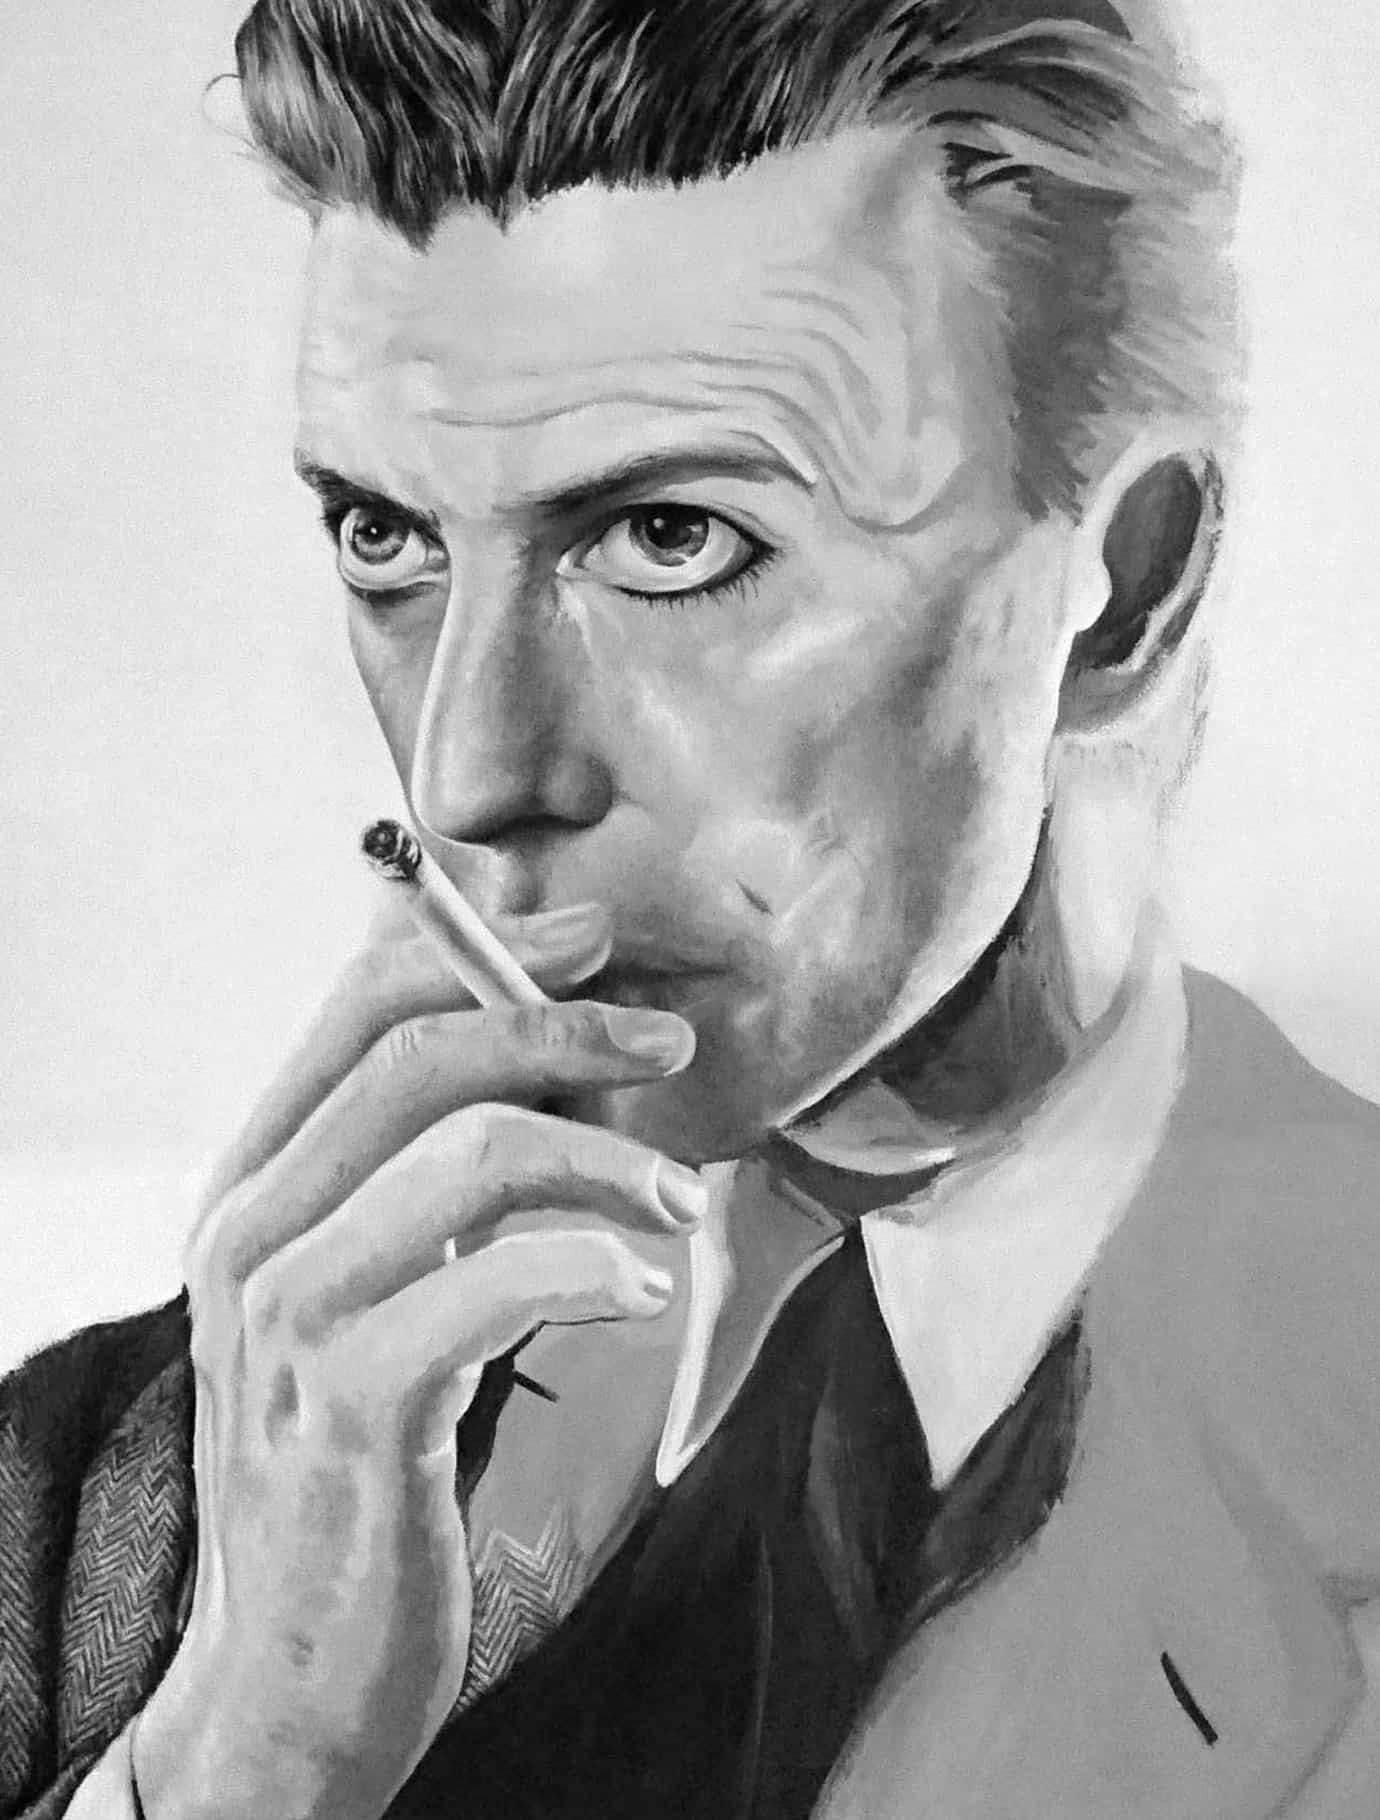 David bowie davidbowie aleena sharif aleenasharif.co.uk gouache paint painting monochrome black white canvas